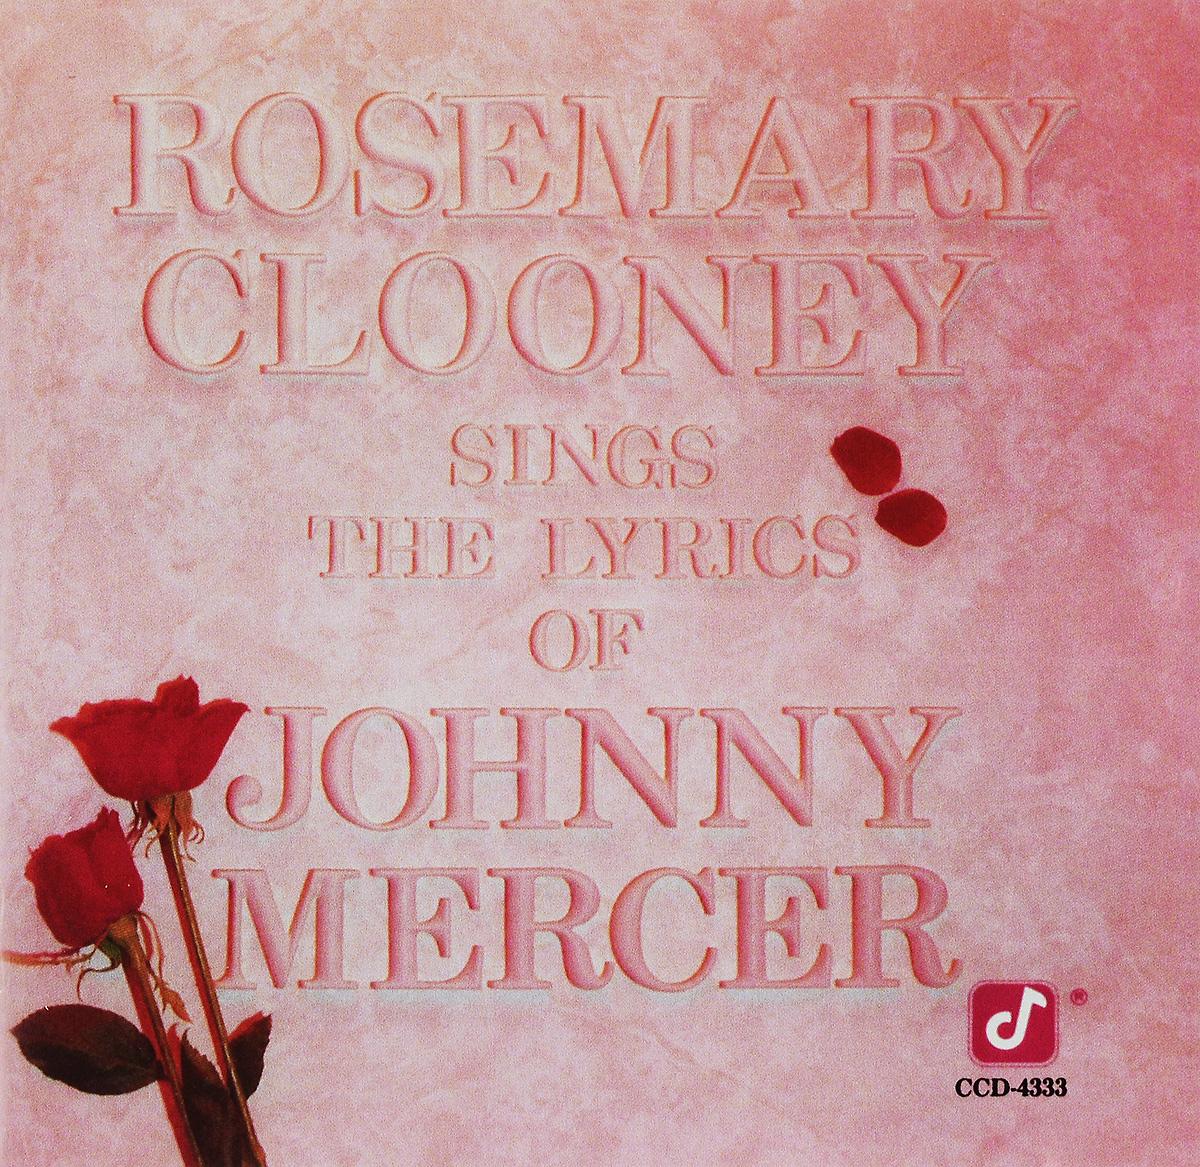 Джонни Мерсер Johnny Mercer. Rosemary Clooney.Sings The Lyrics Of Johnny Mercer mercer culinary mercer rules culinary mini